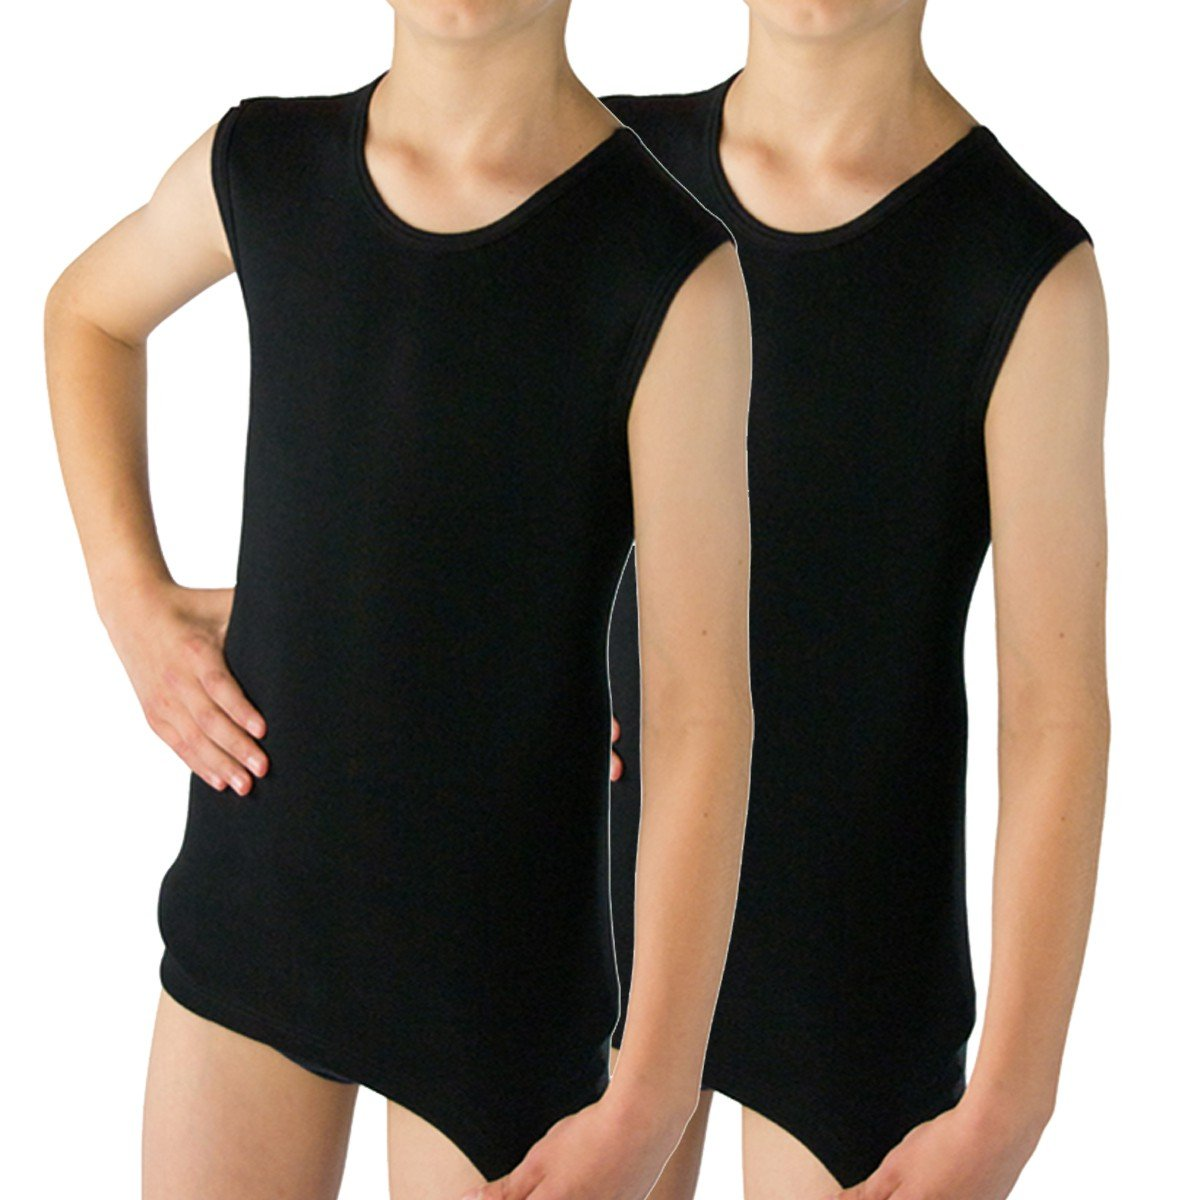 HERMKO 2040 2 Pack Boys' Vest